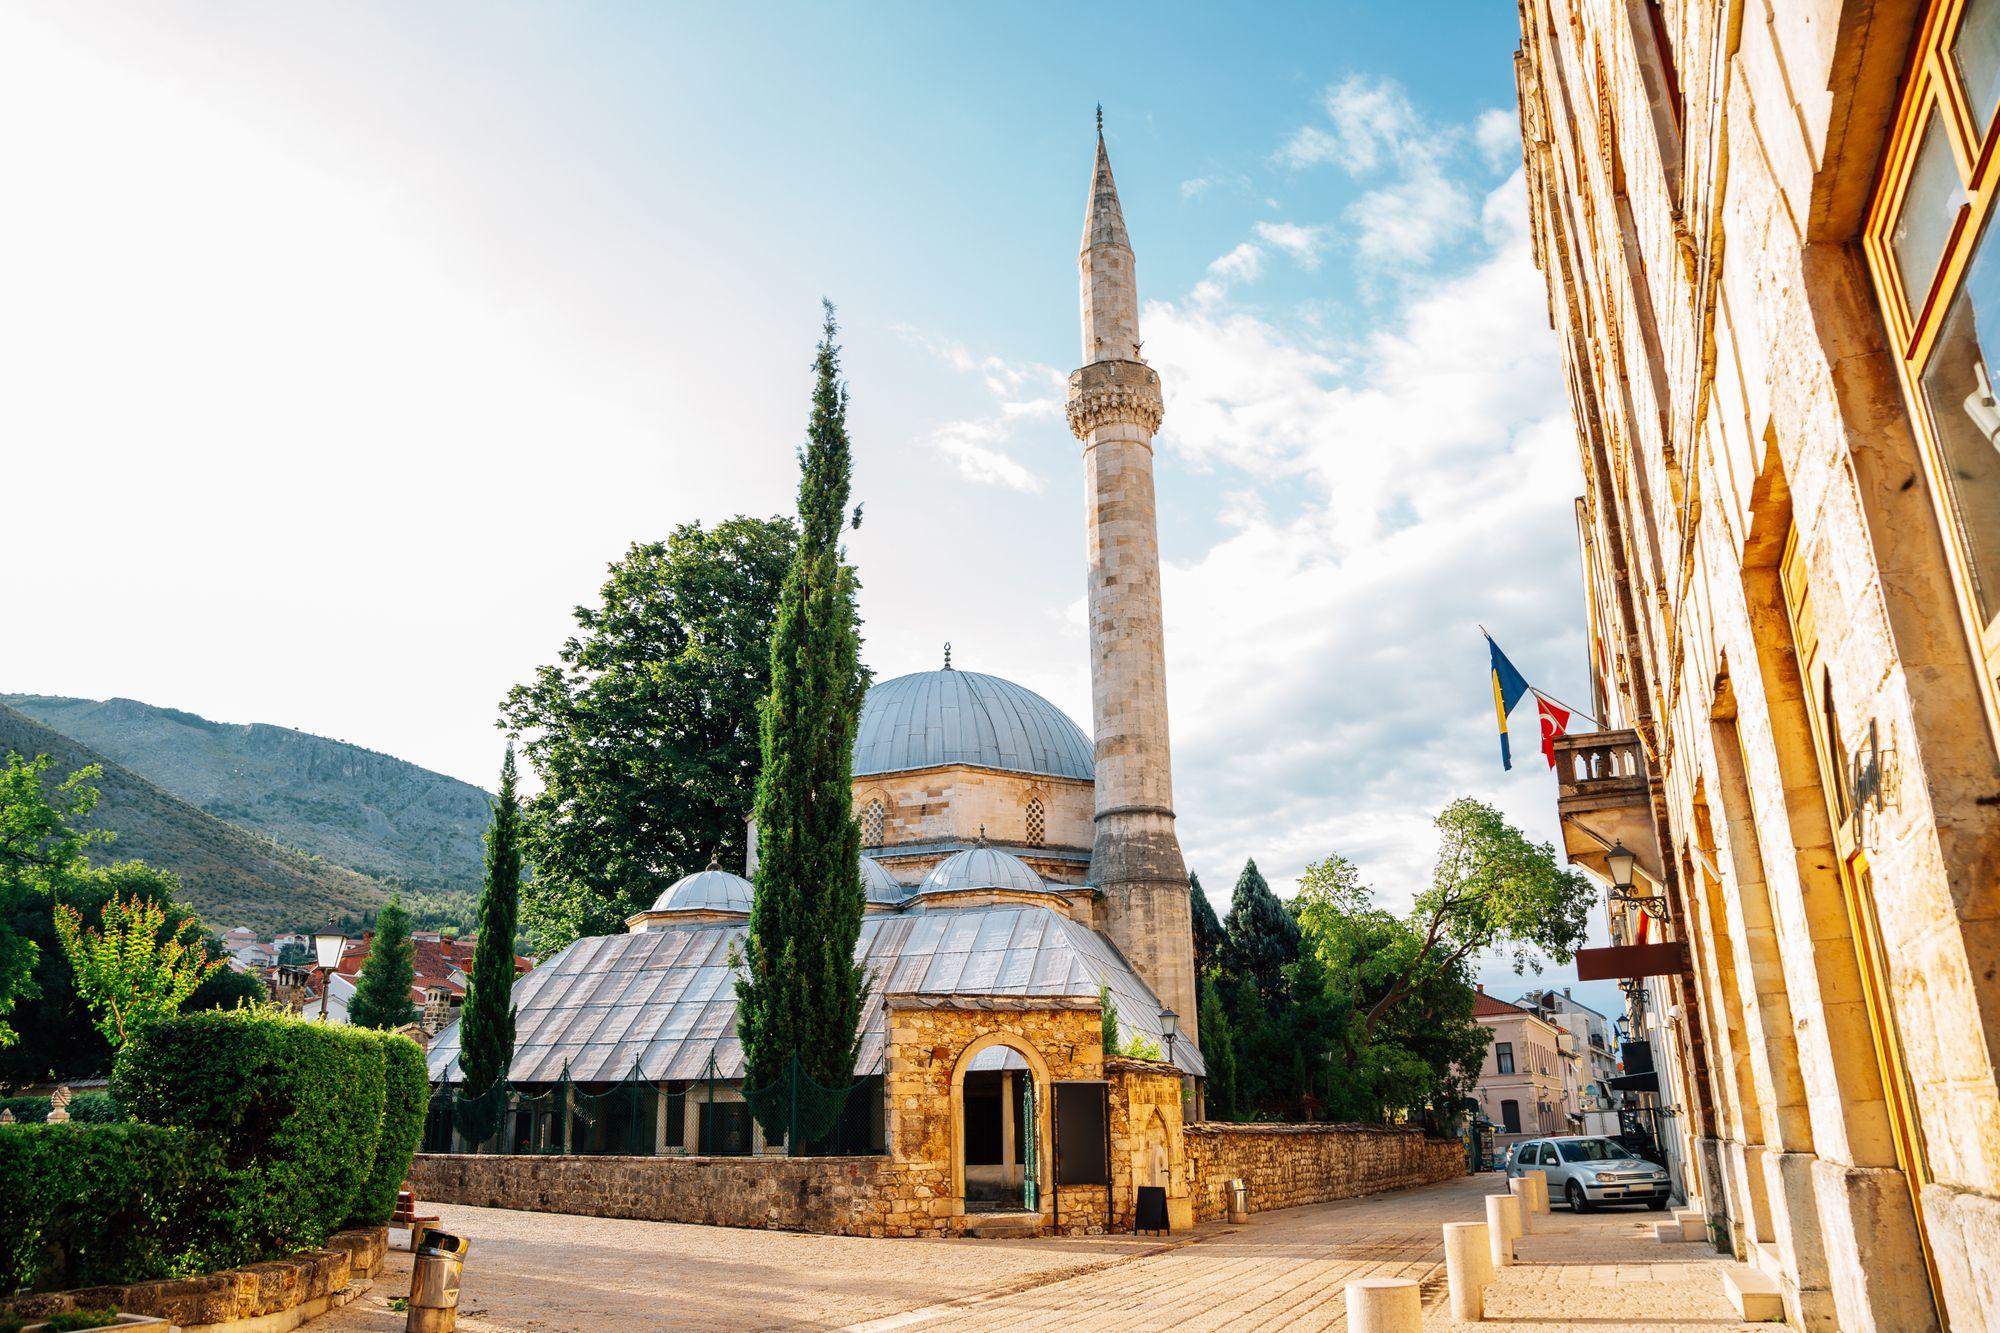 Karadoz Bey Mosque, Mostar